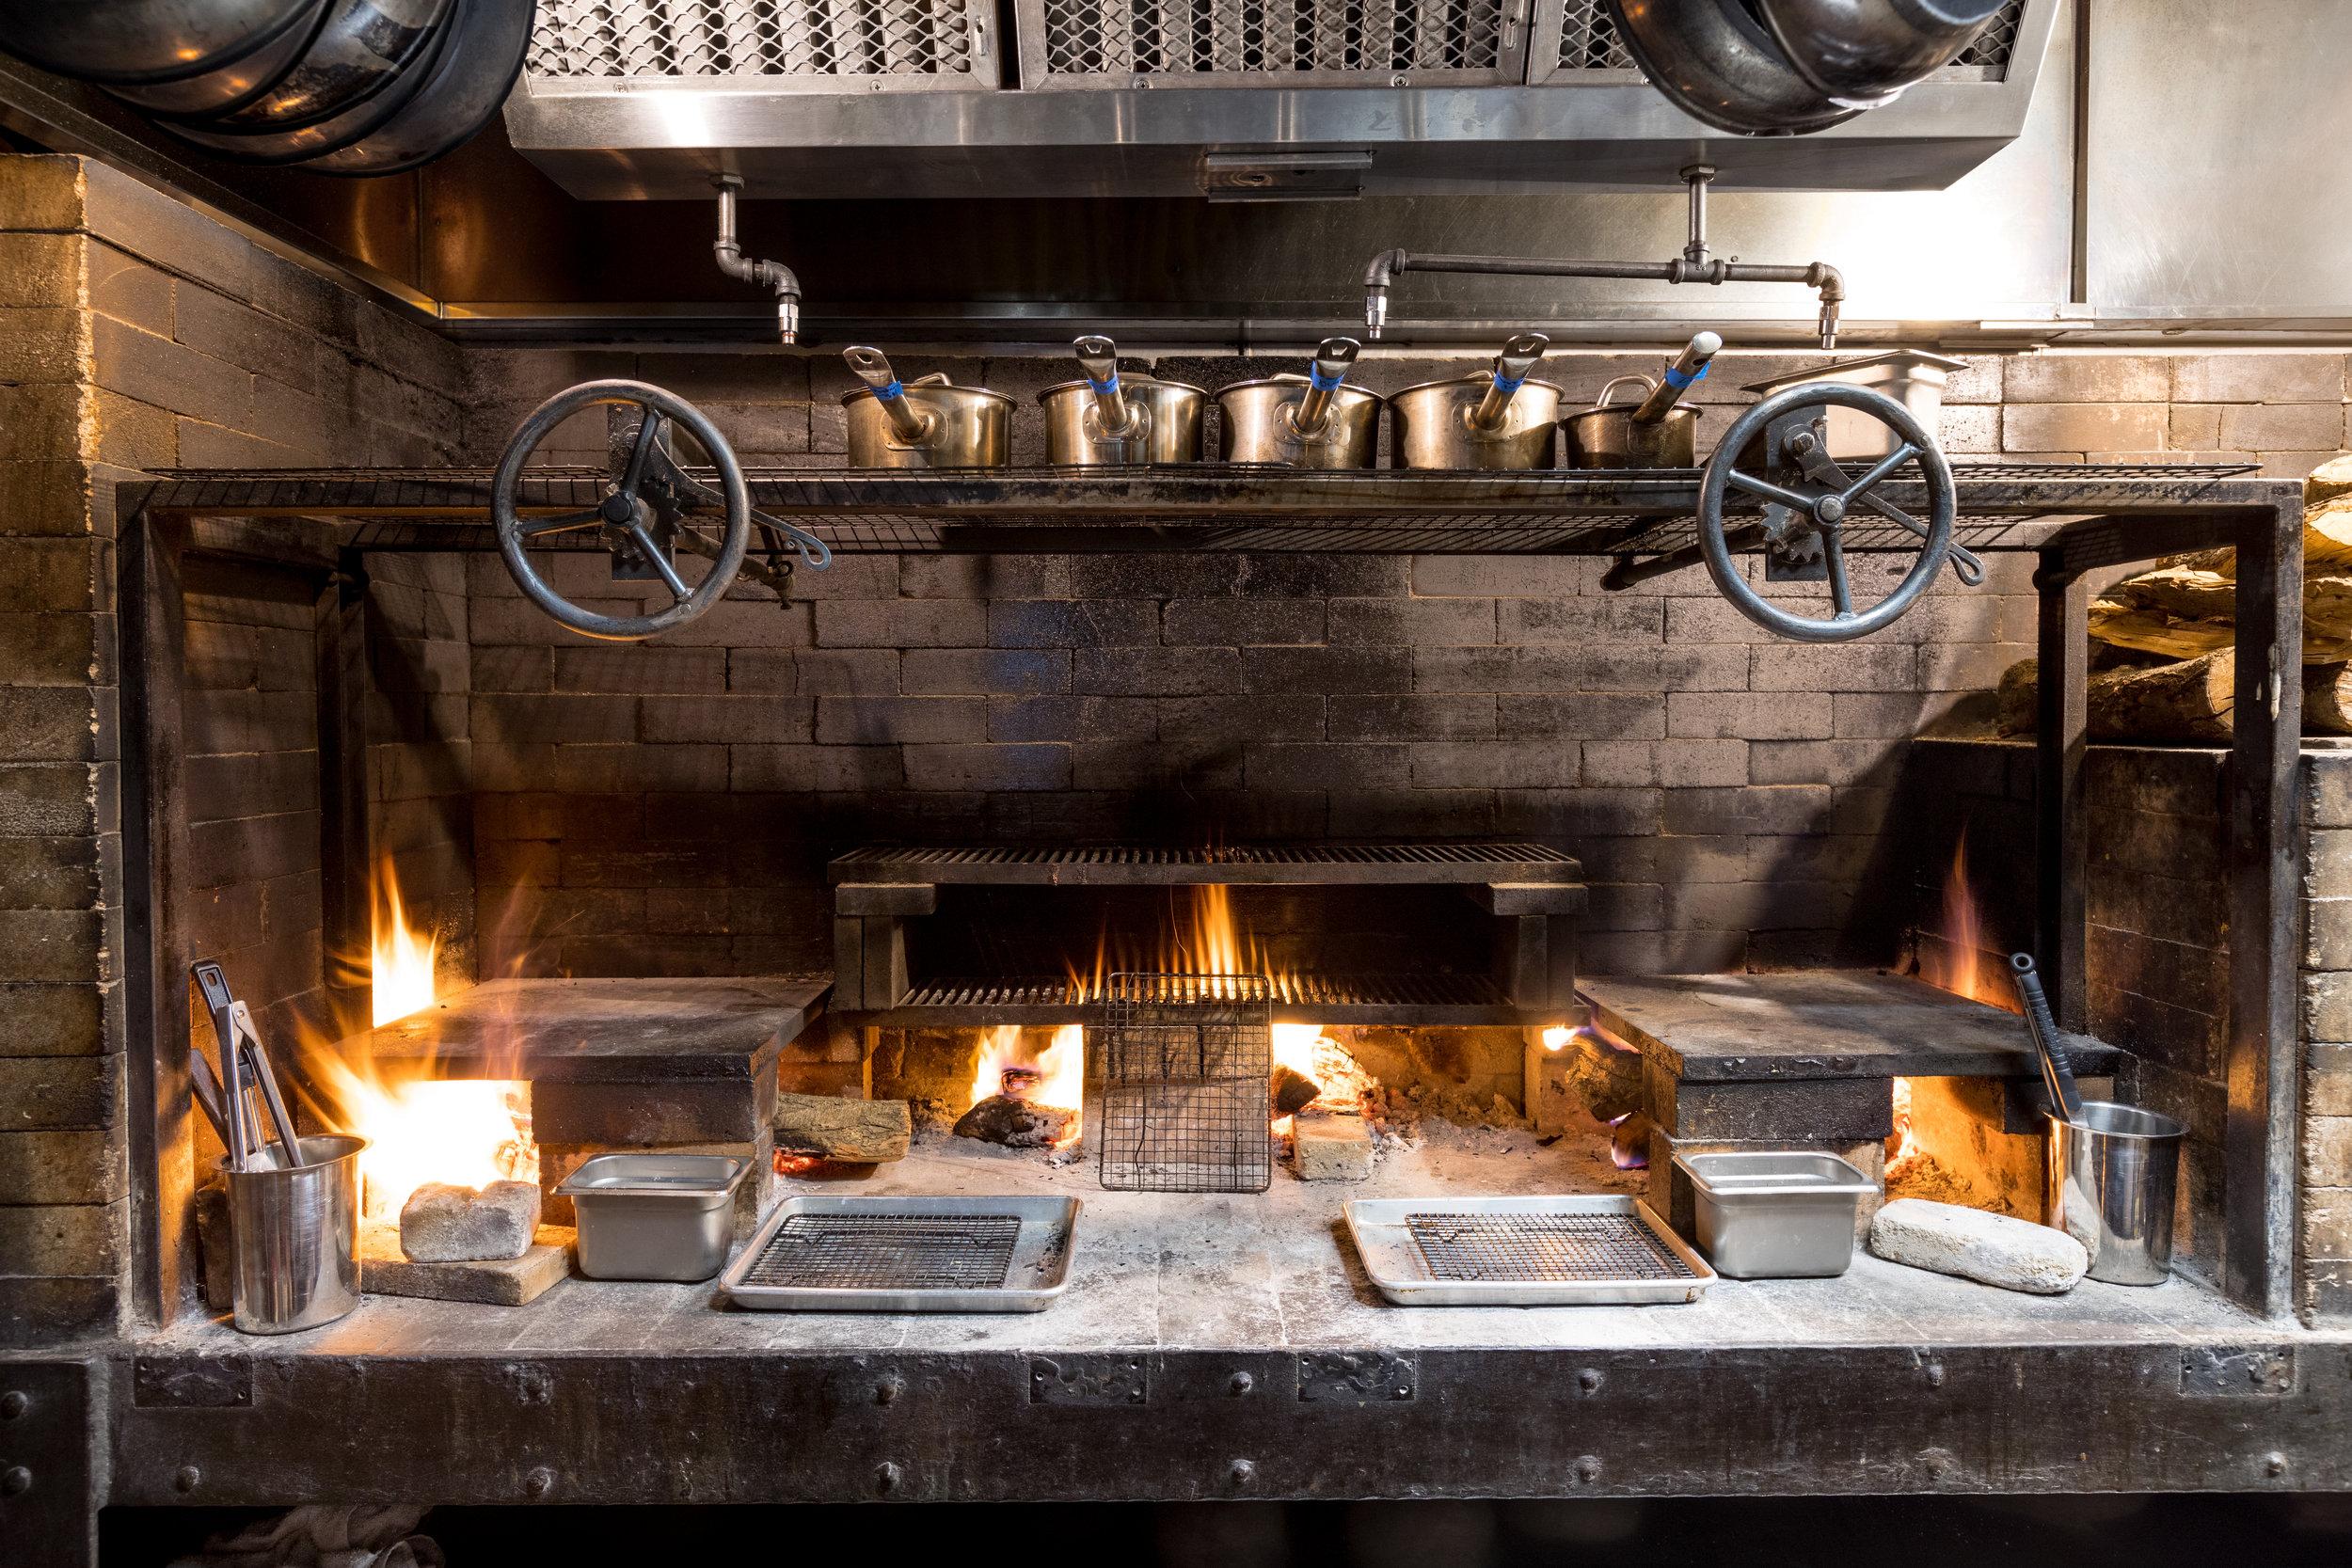 Scratch kitchen stove